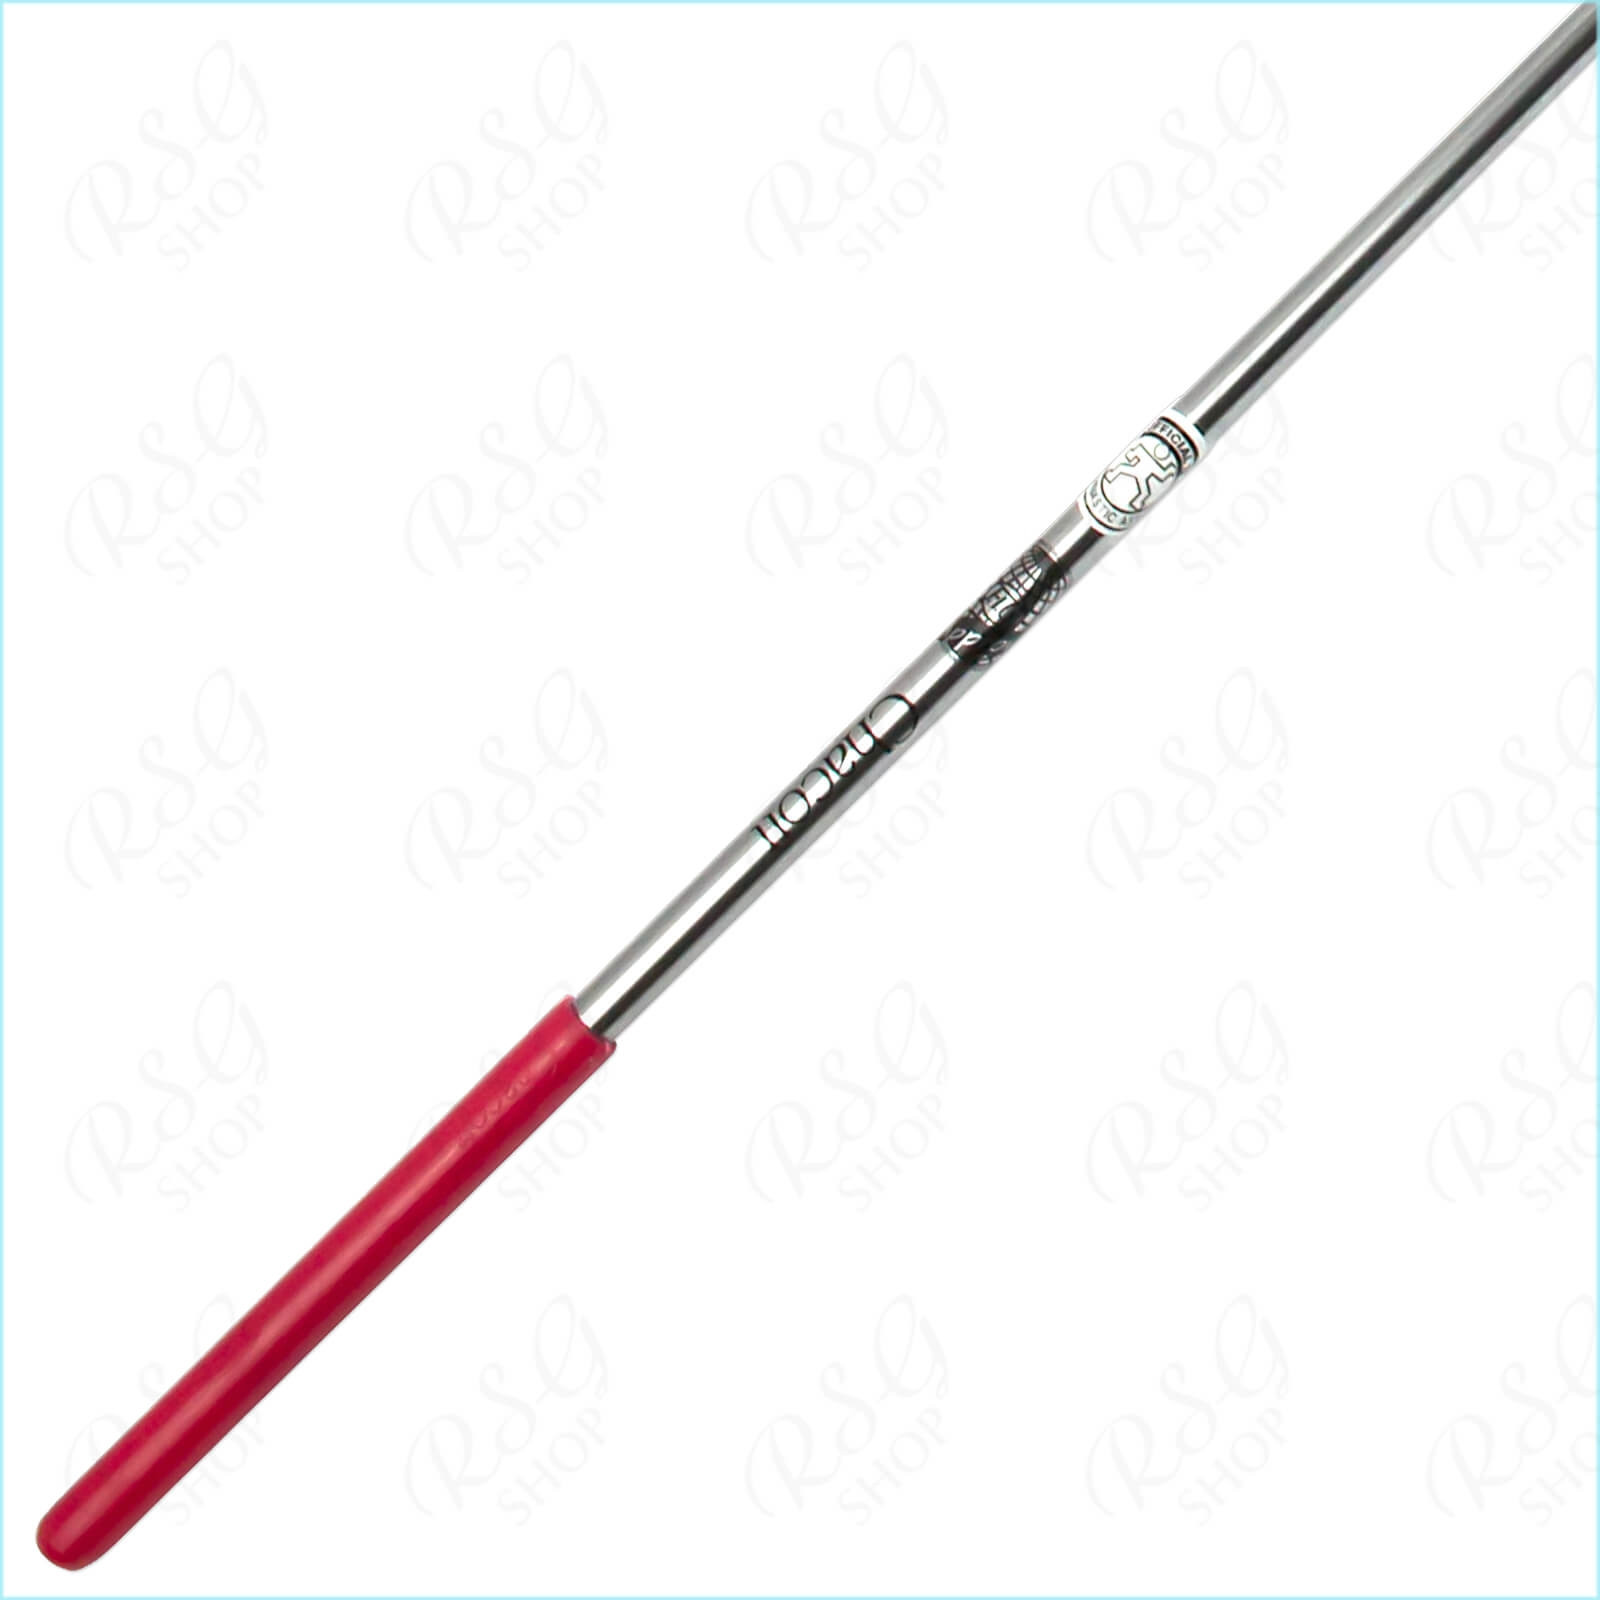 stab_chacott_fiberglass_soft_60cm_silber_metallic_red